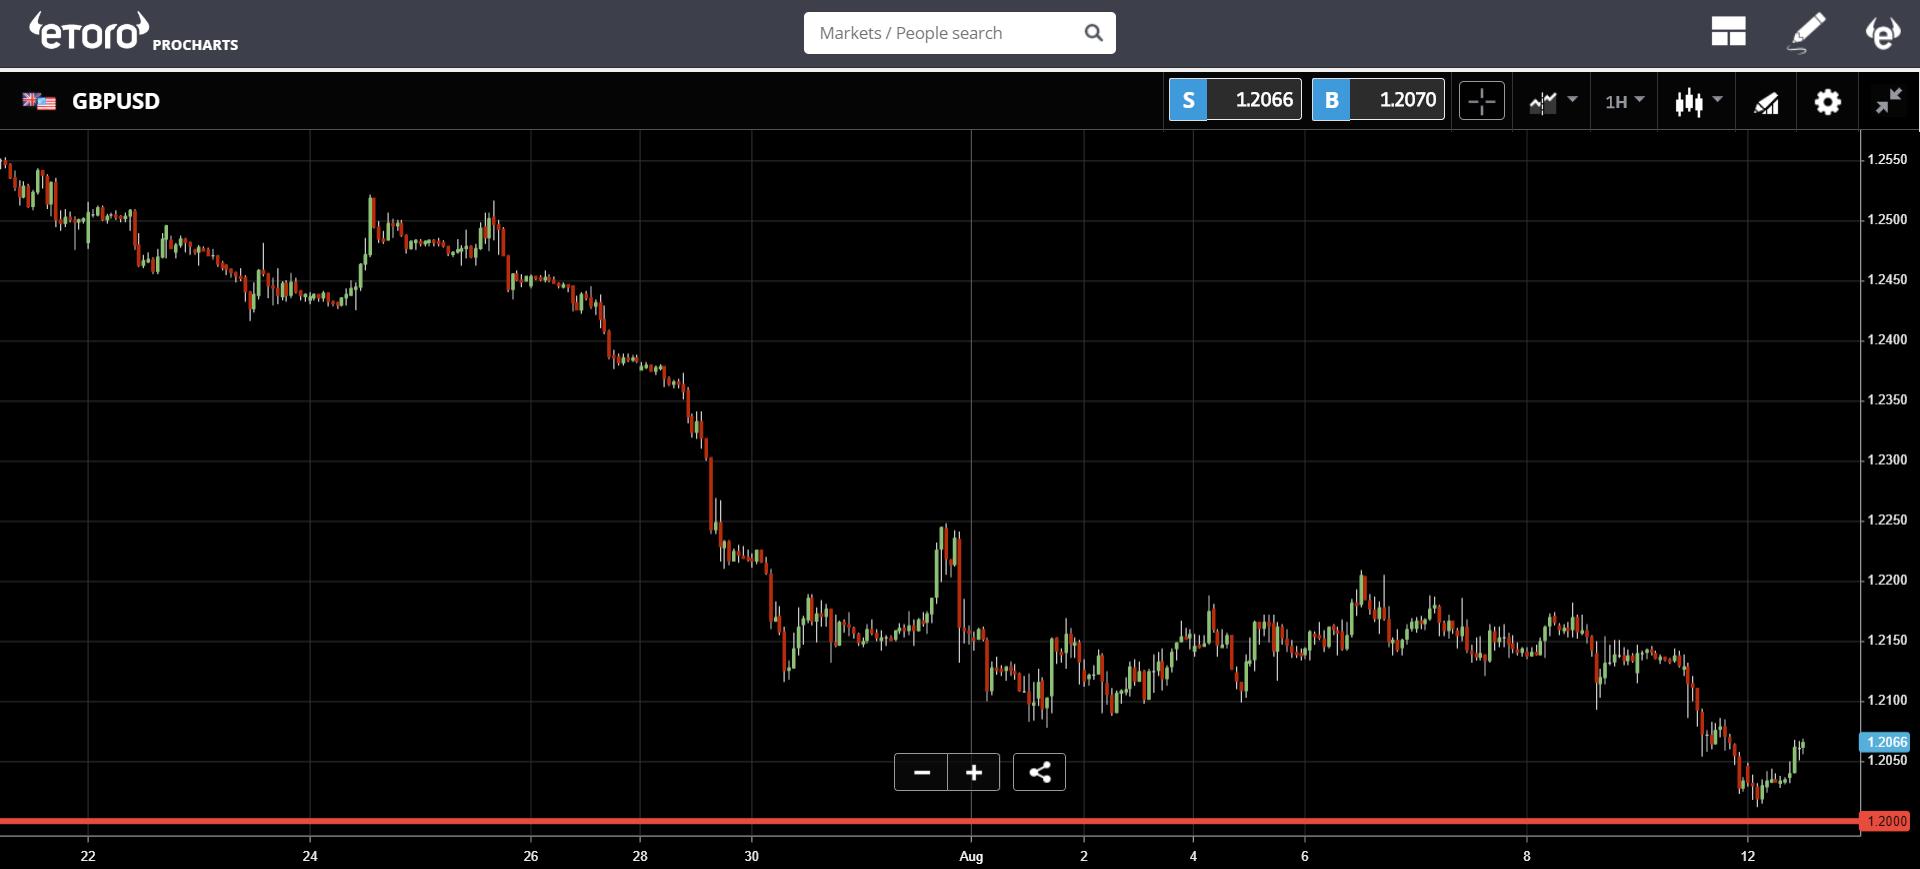 market,stocks, cryptocurrency, bitcoin, blockchain, ethereum, trading, economy, US, fed